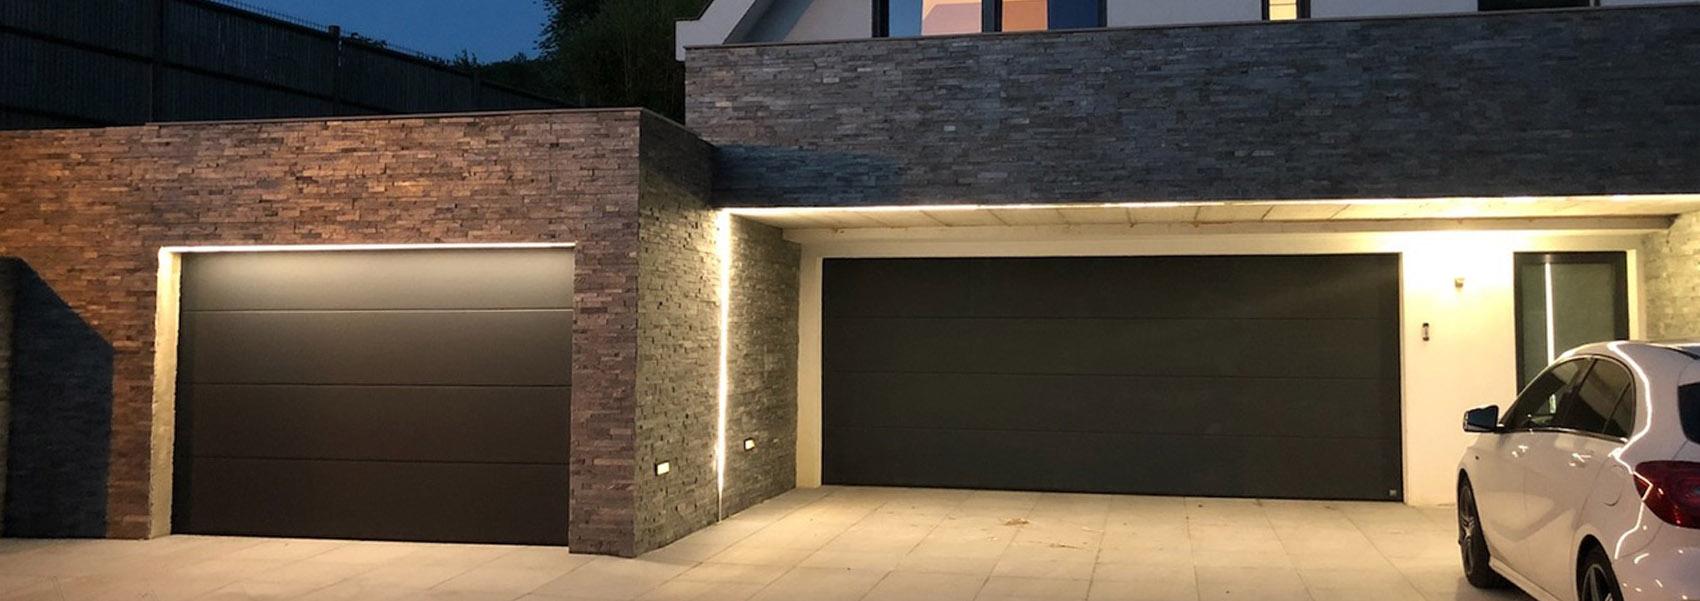 Installation porte garage alu haut rhin territoire de for Porte garage haut rhin